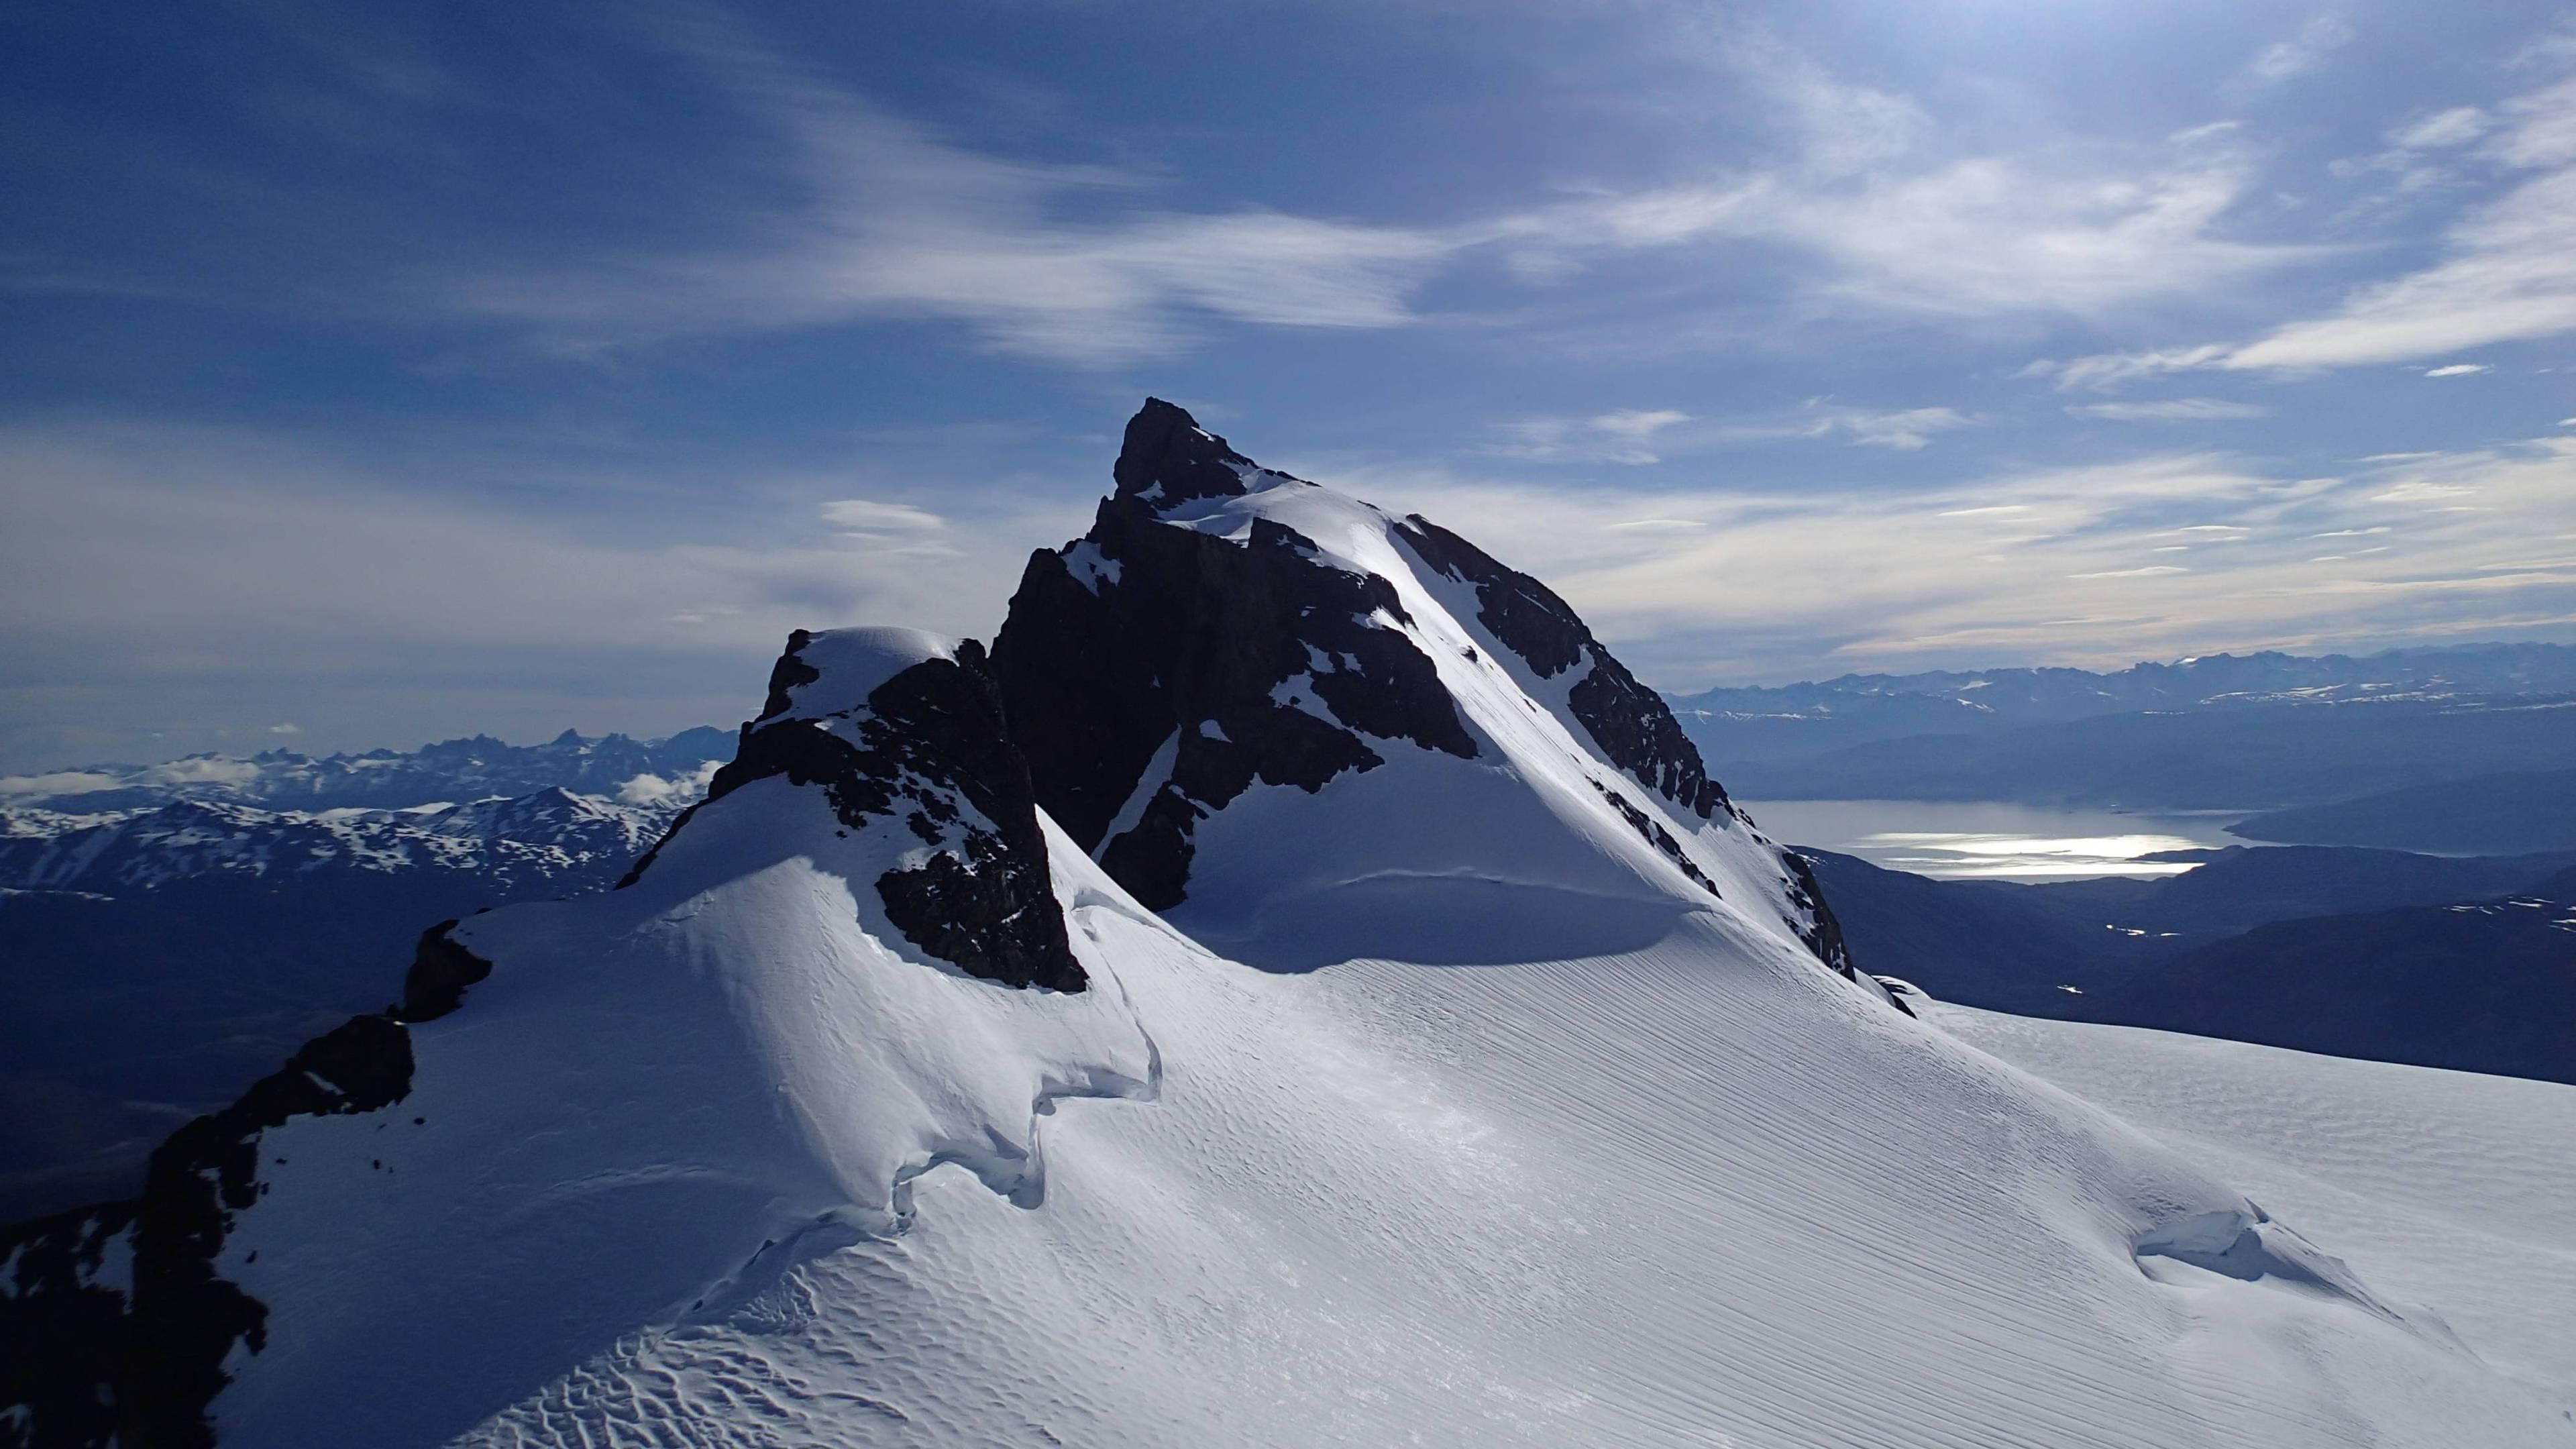 BOTPOST] Cerro Ventisquero Patagonia [3840x2160] iimgurcom 3840x2160